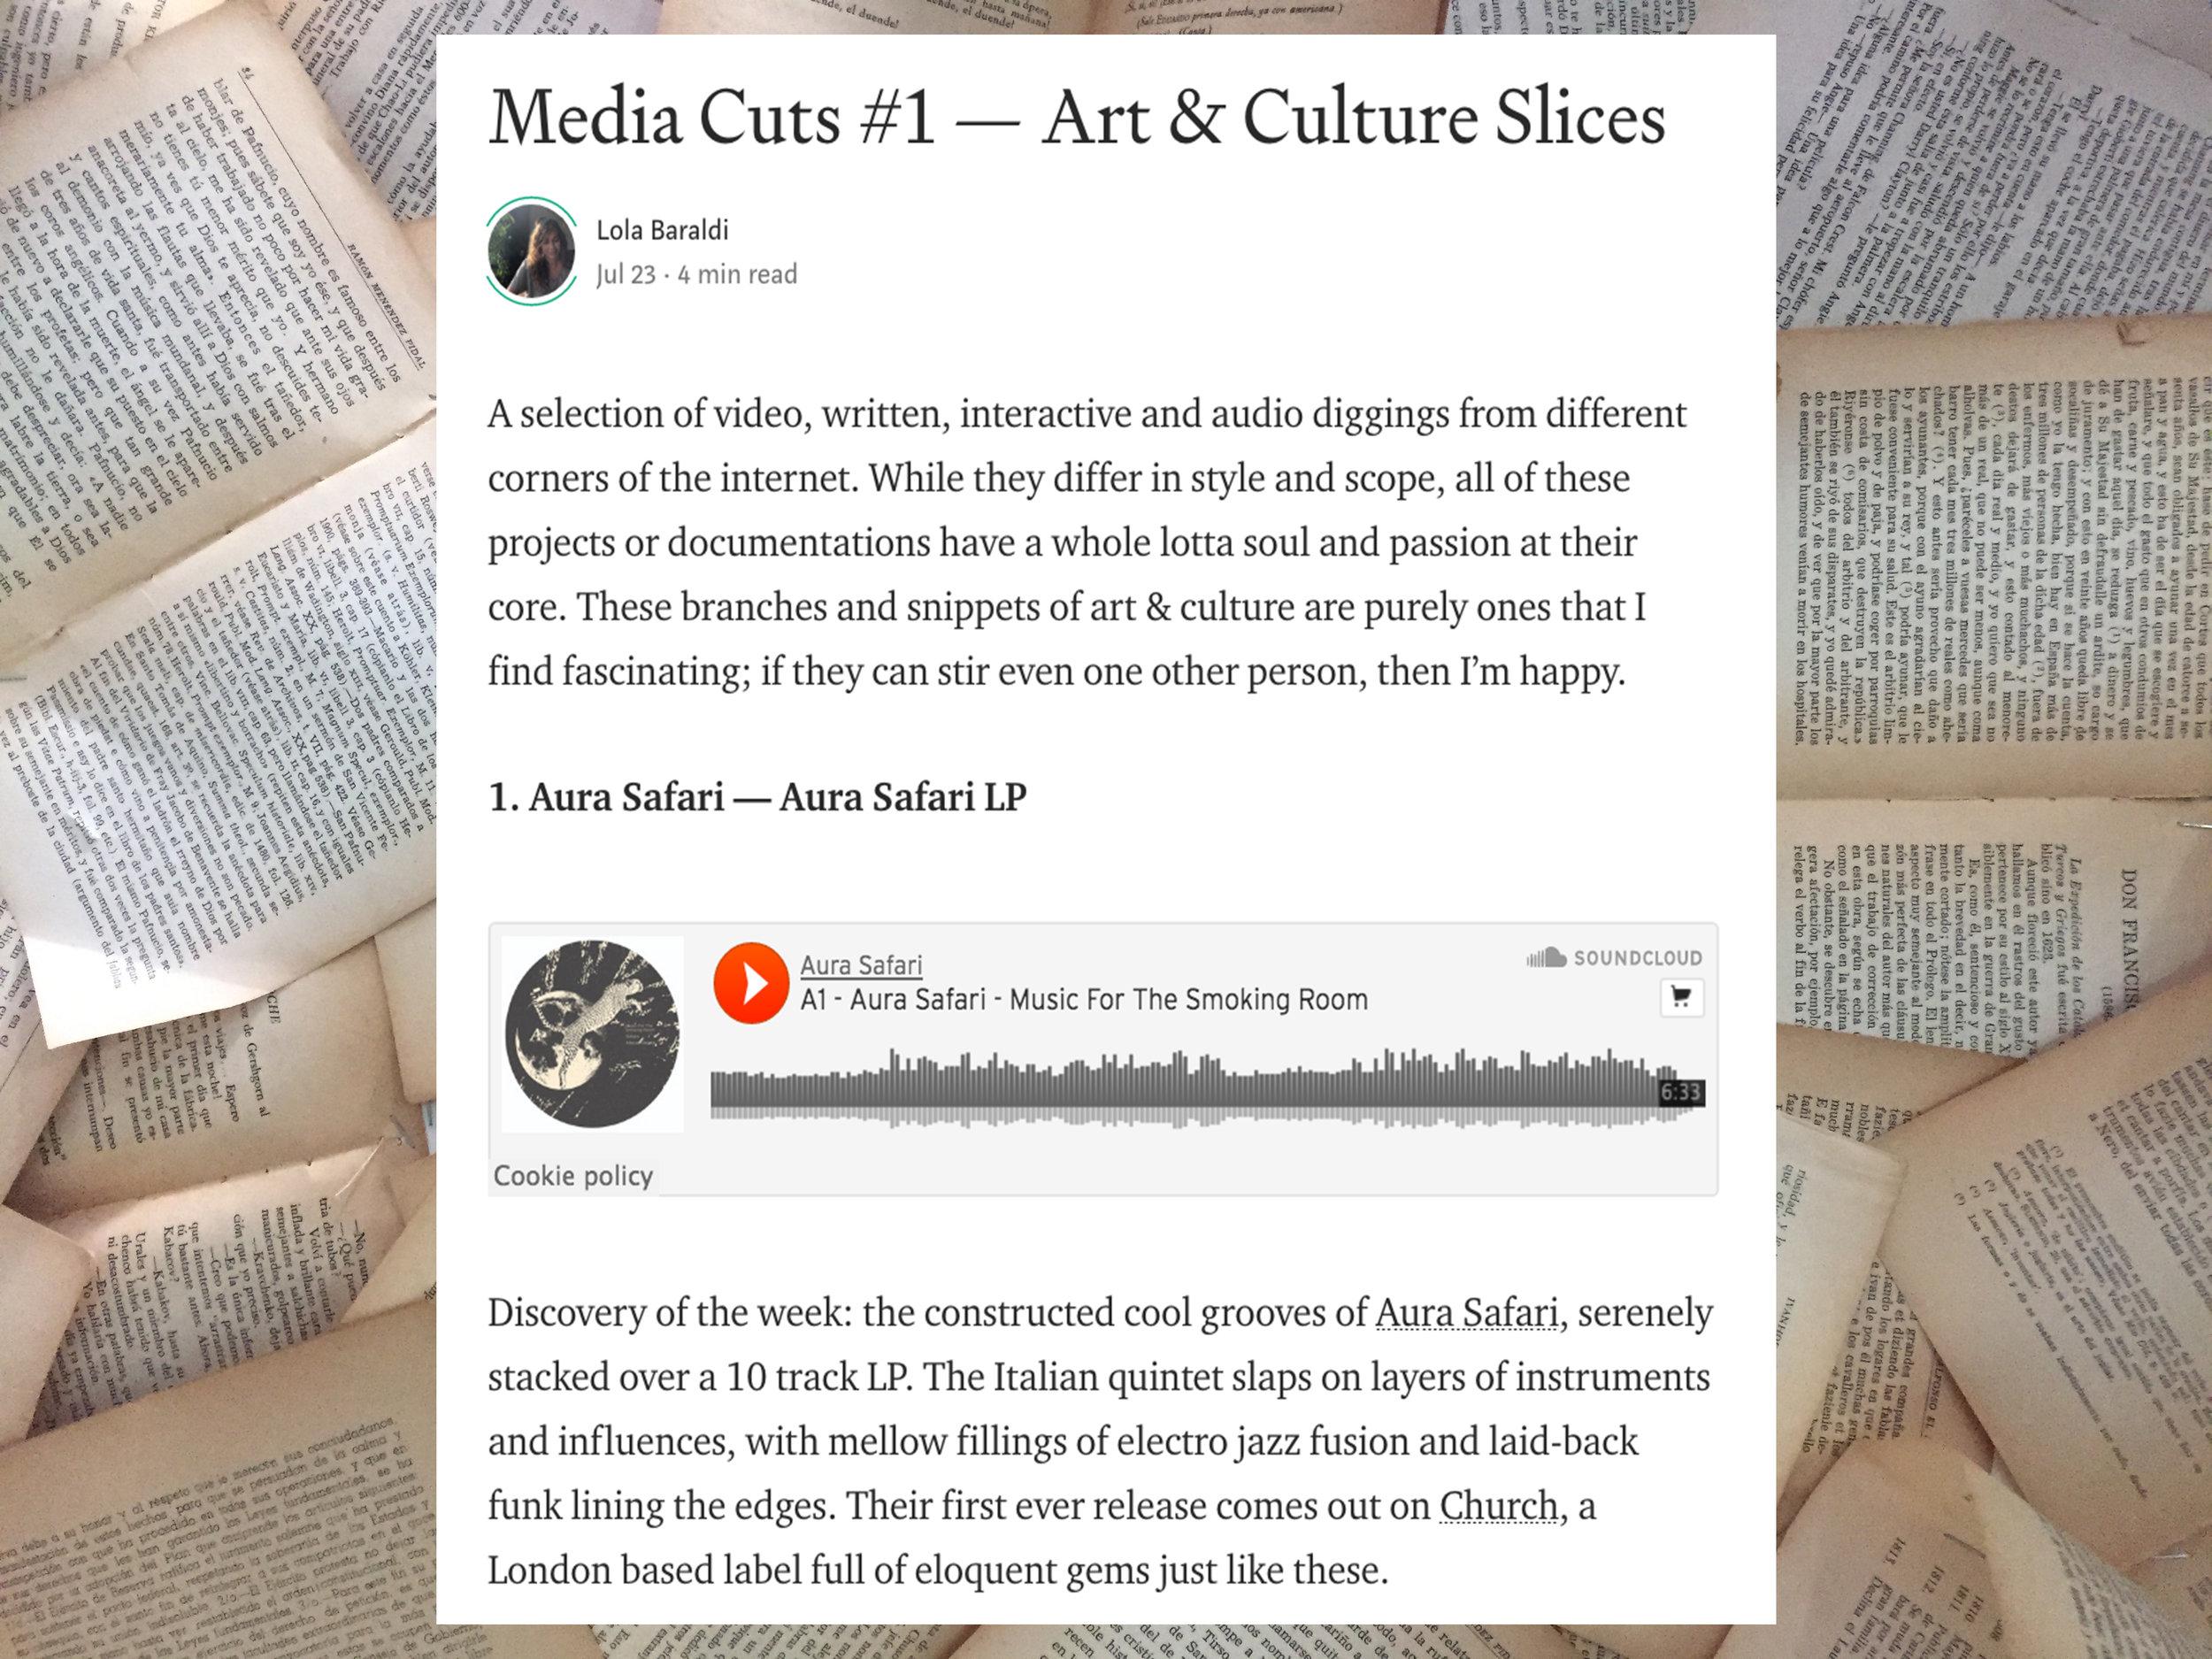 MEDIA CUTS #1